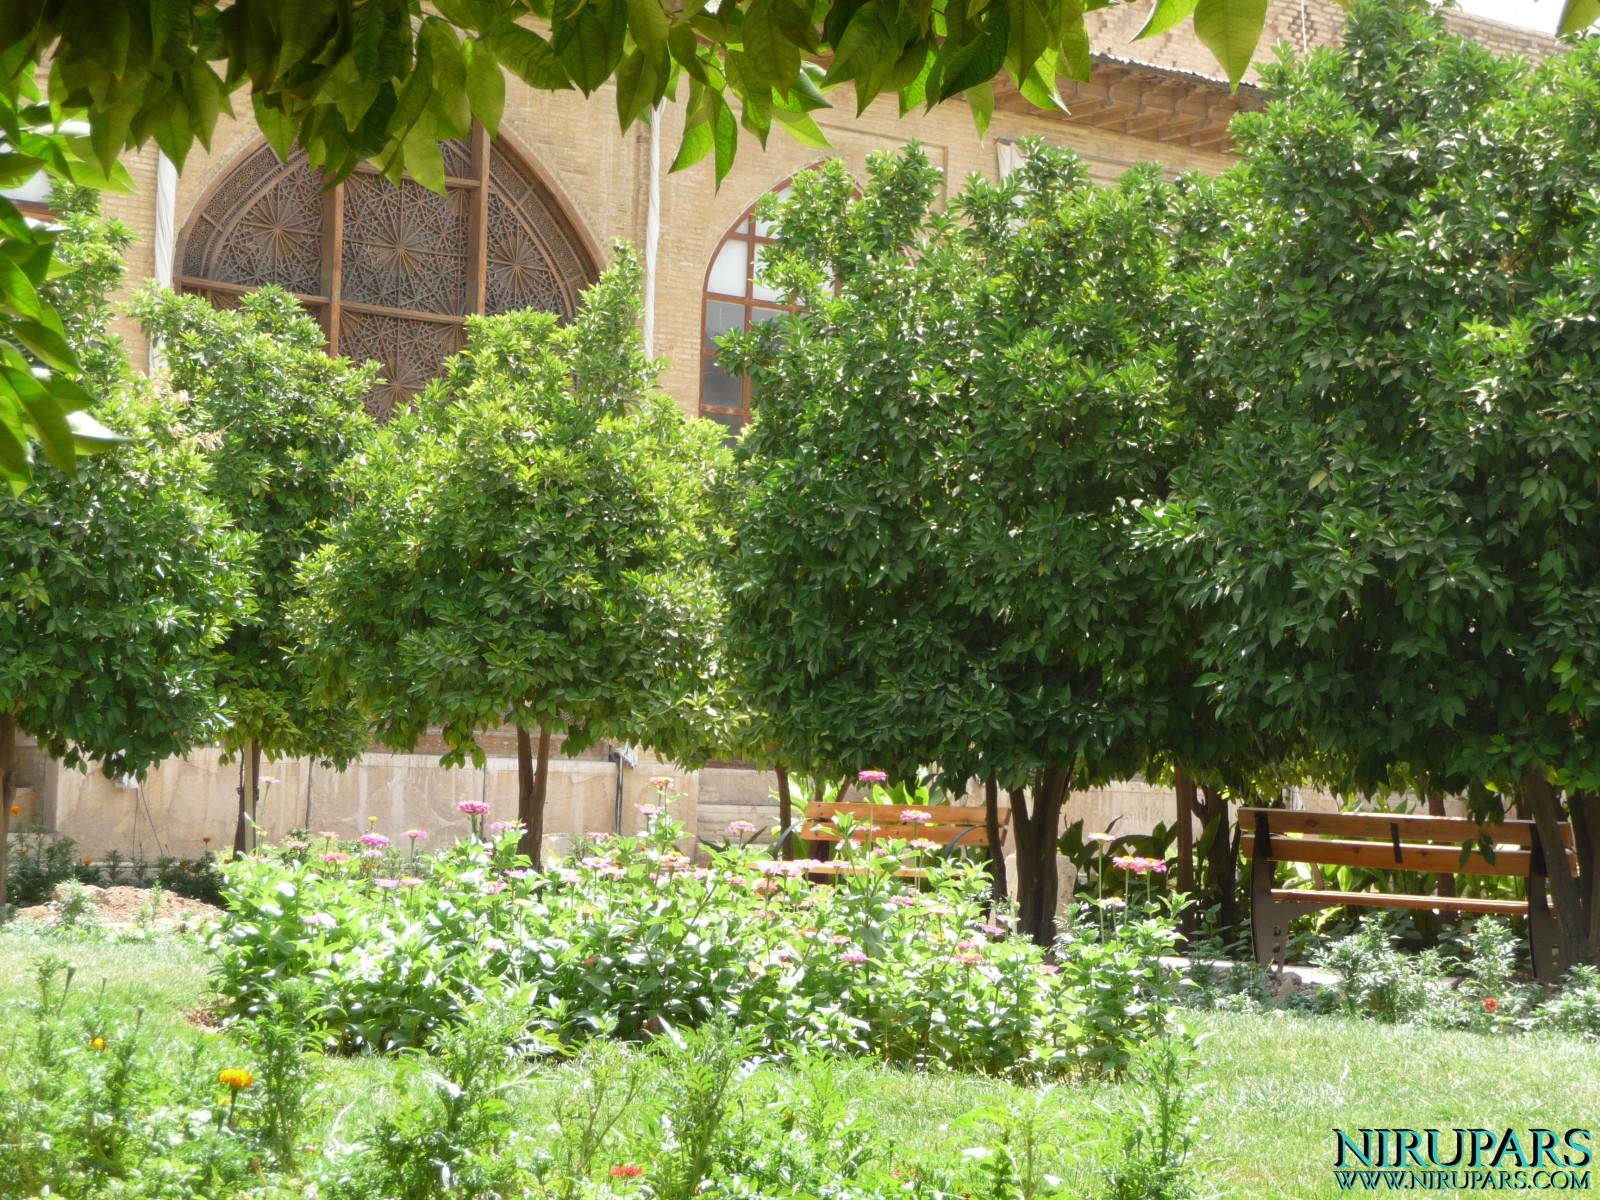 Arg-e Karim Khan - Garden and Flowers